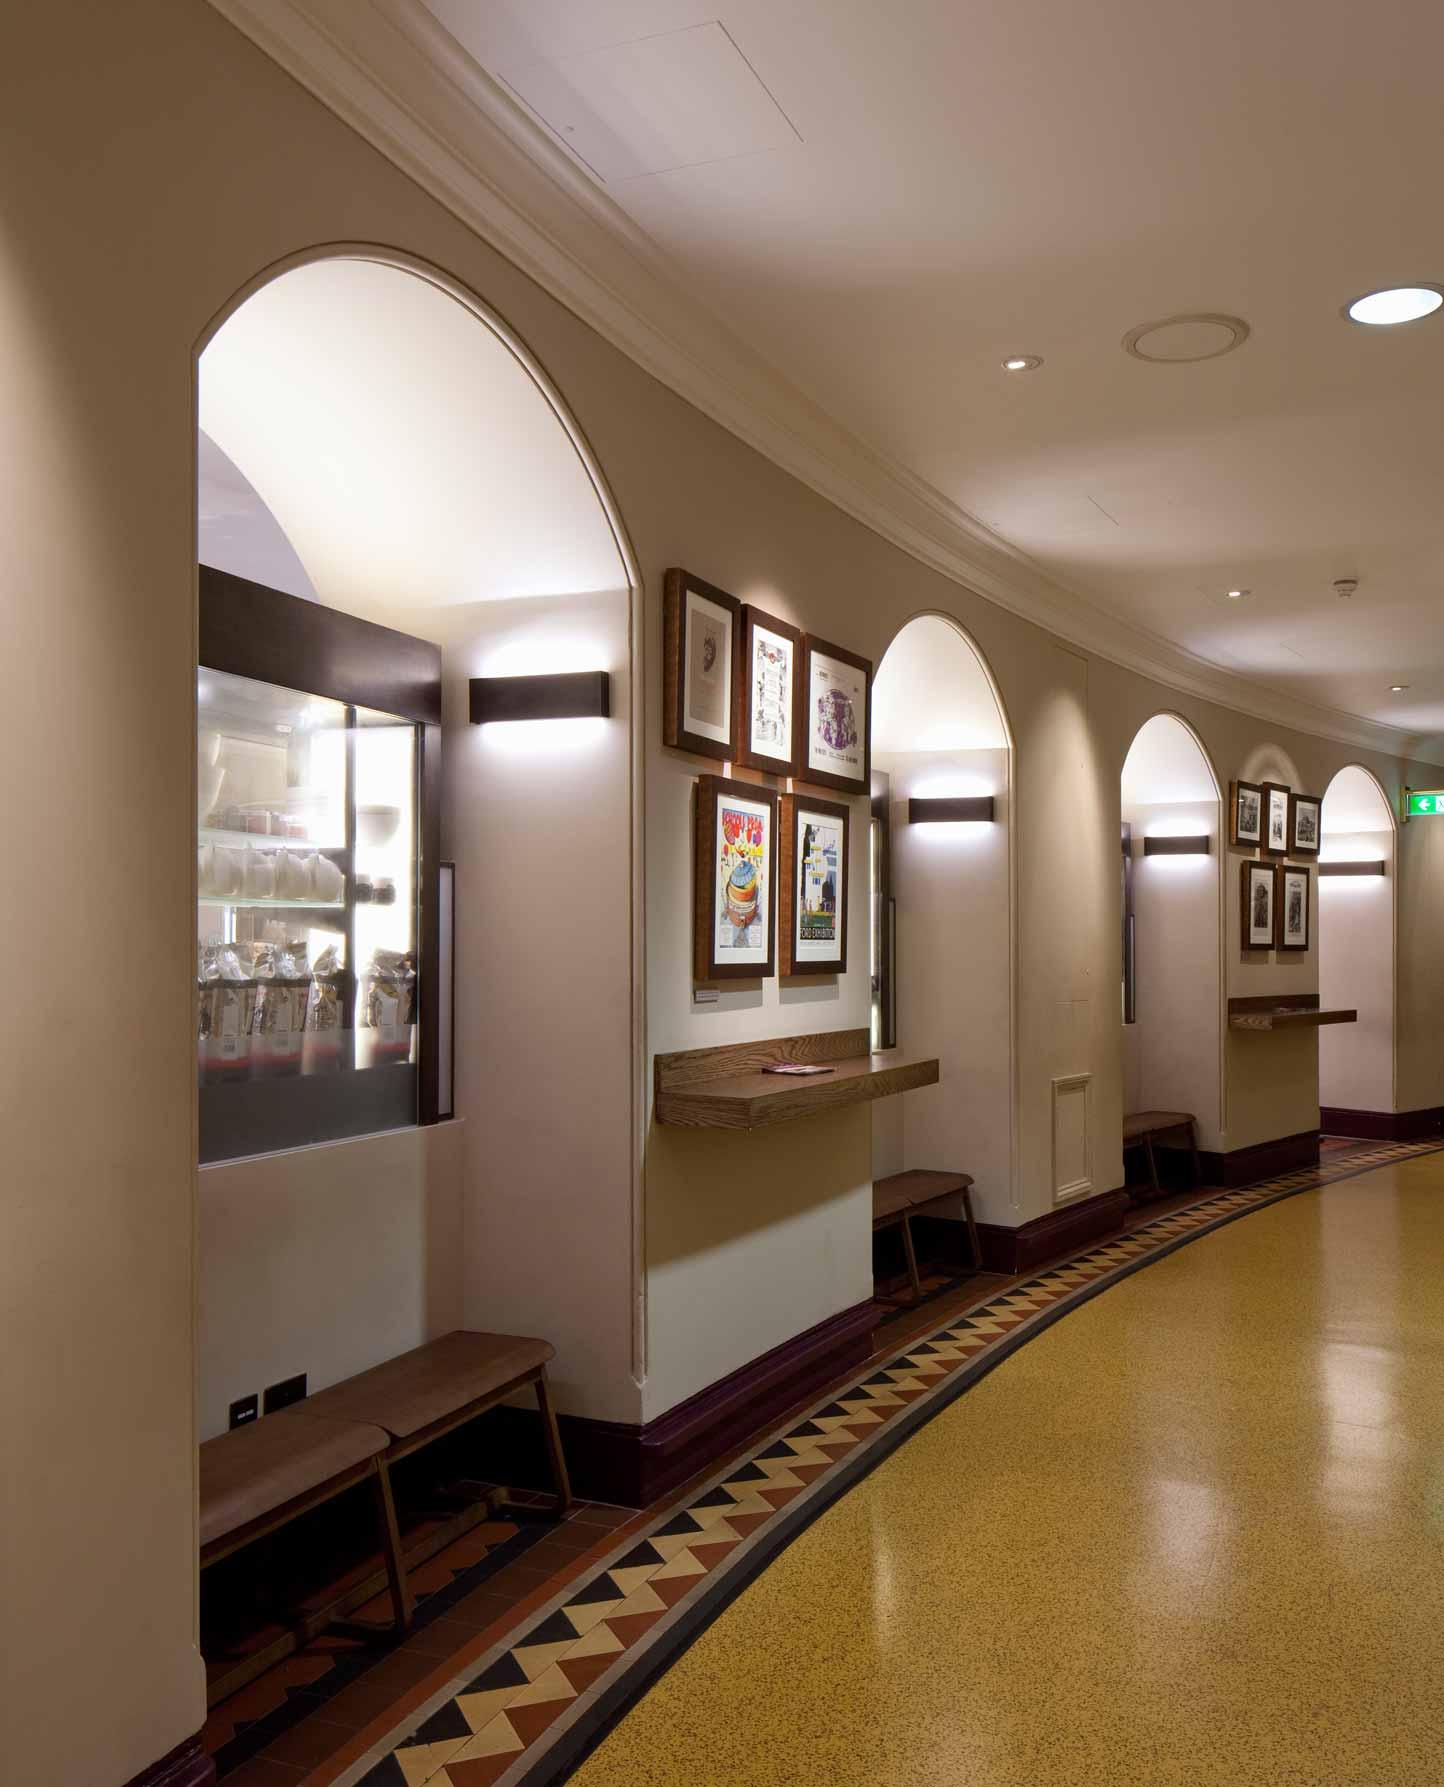 Illuminated Arches Corridor Royal Albert Hall Wall Lights Nulty Bespoke